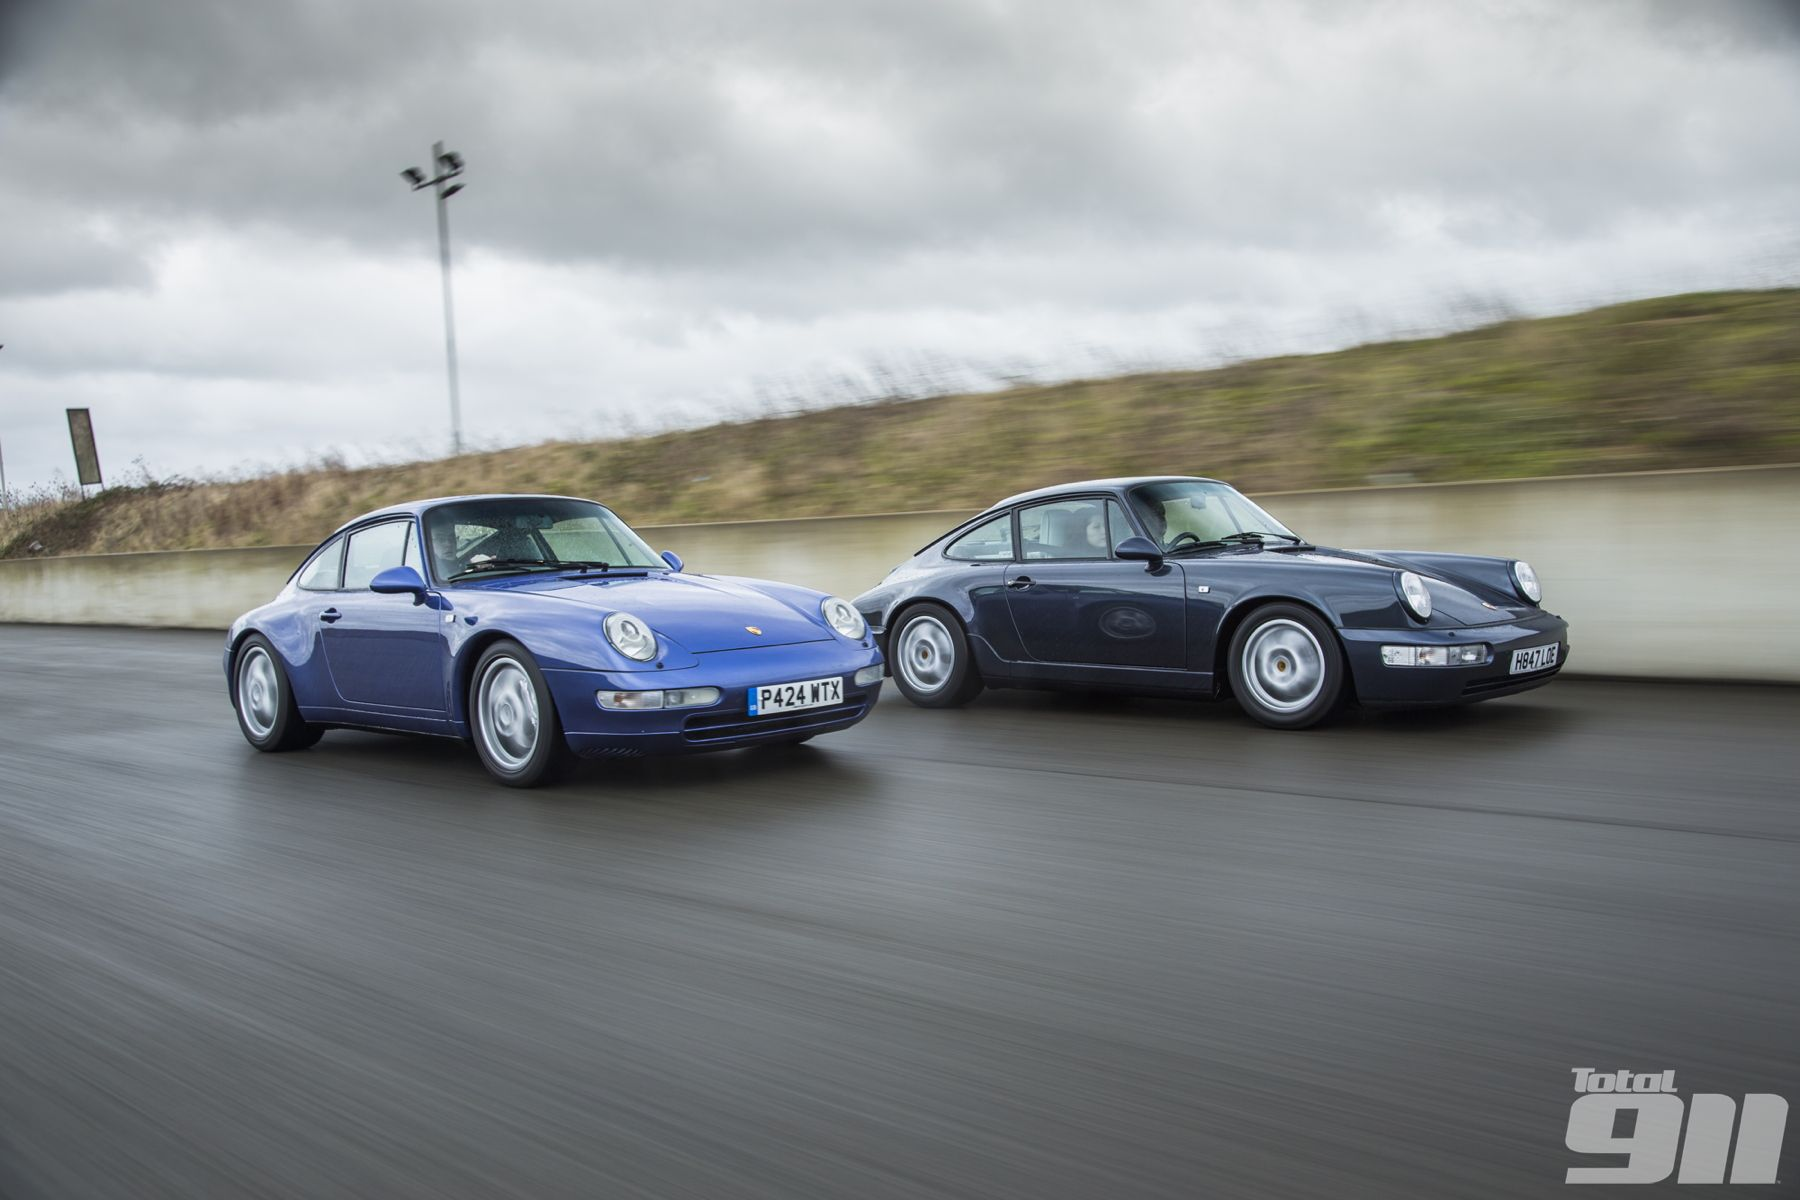 K Roll S Porsche 911 Generational Comparison 993 Vs 964 Porsche 911 Porsche Porsche 964